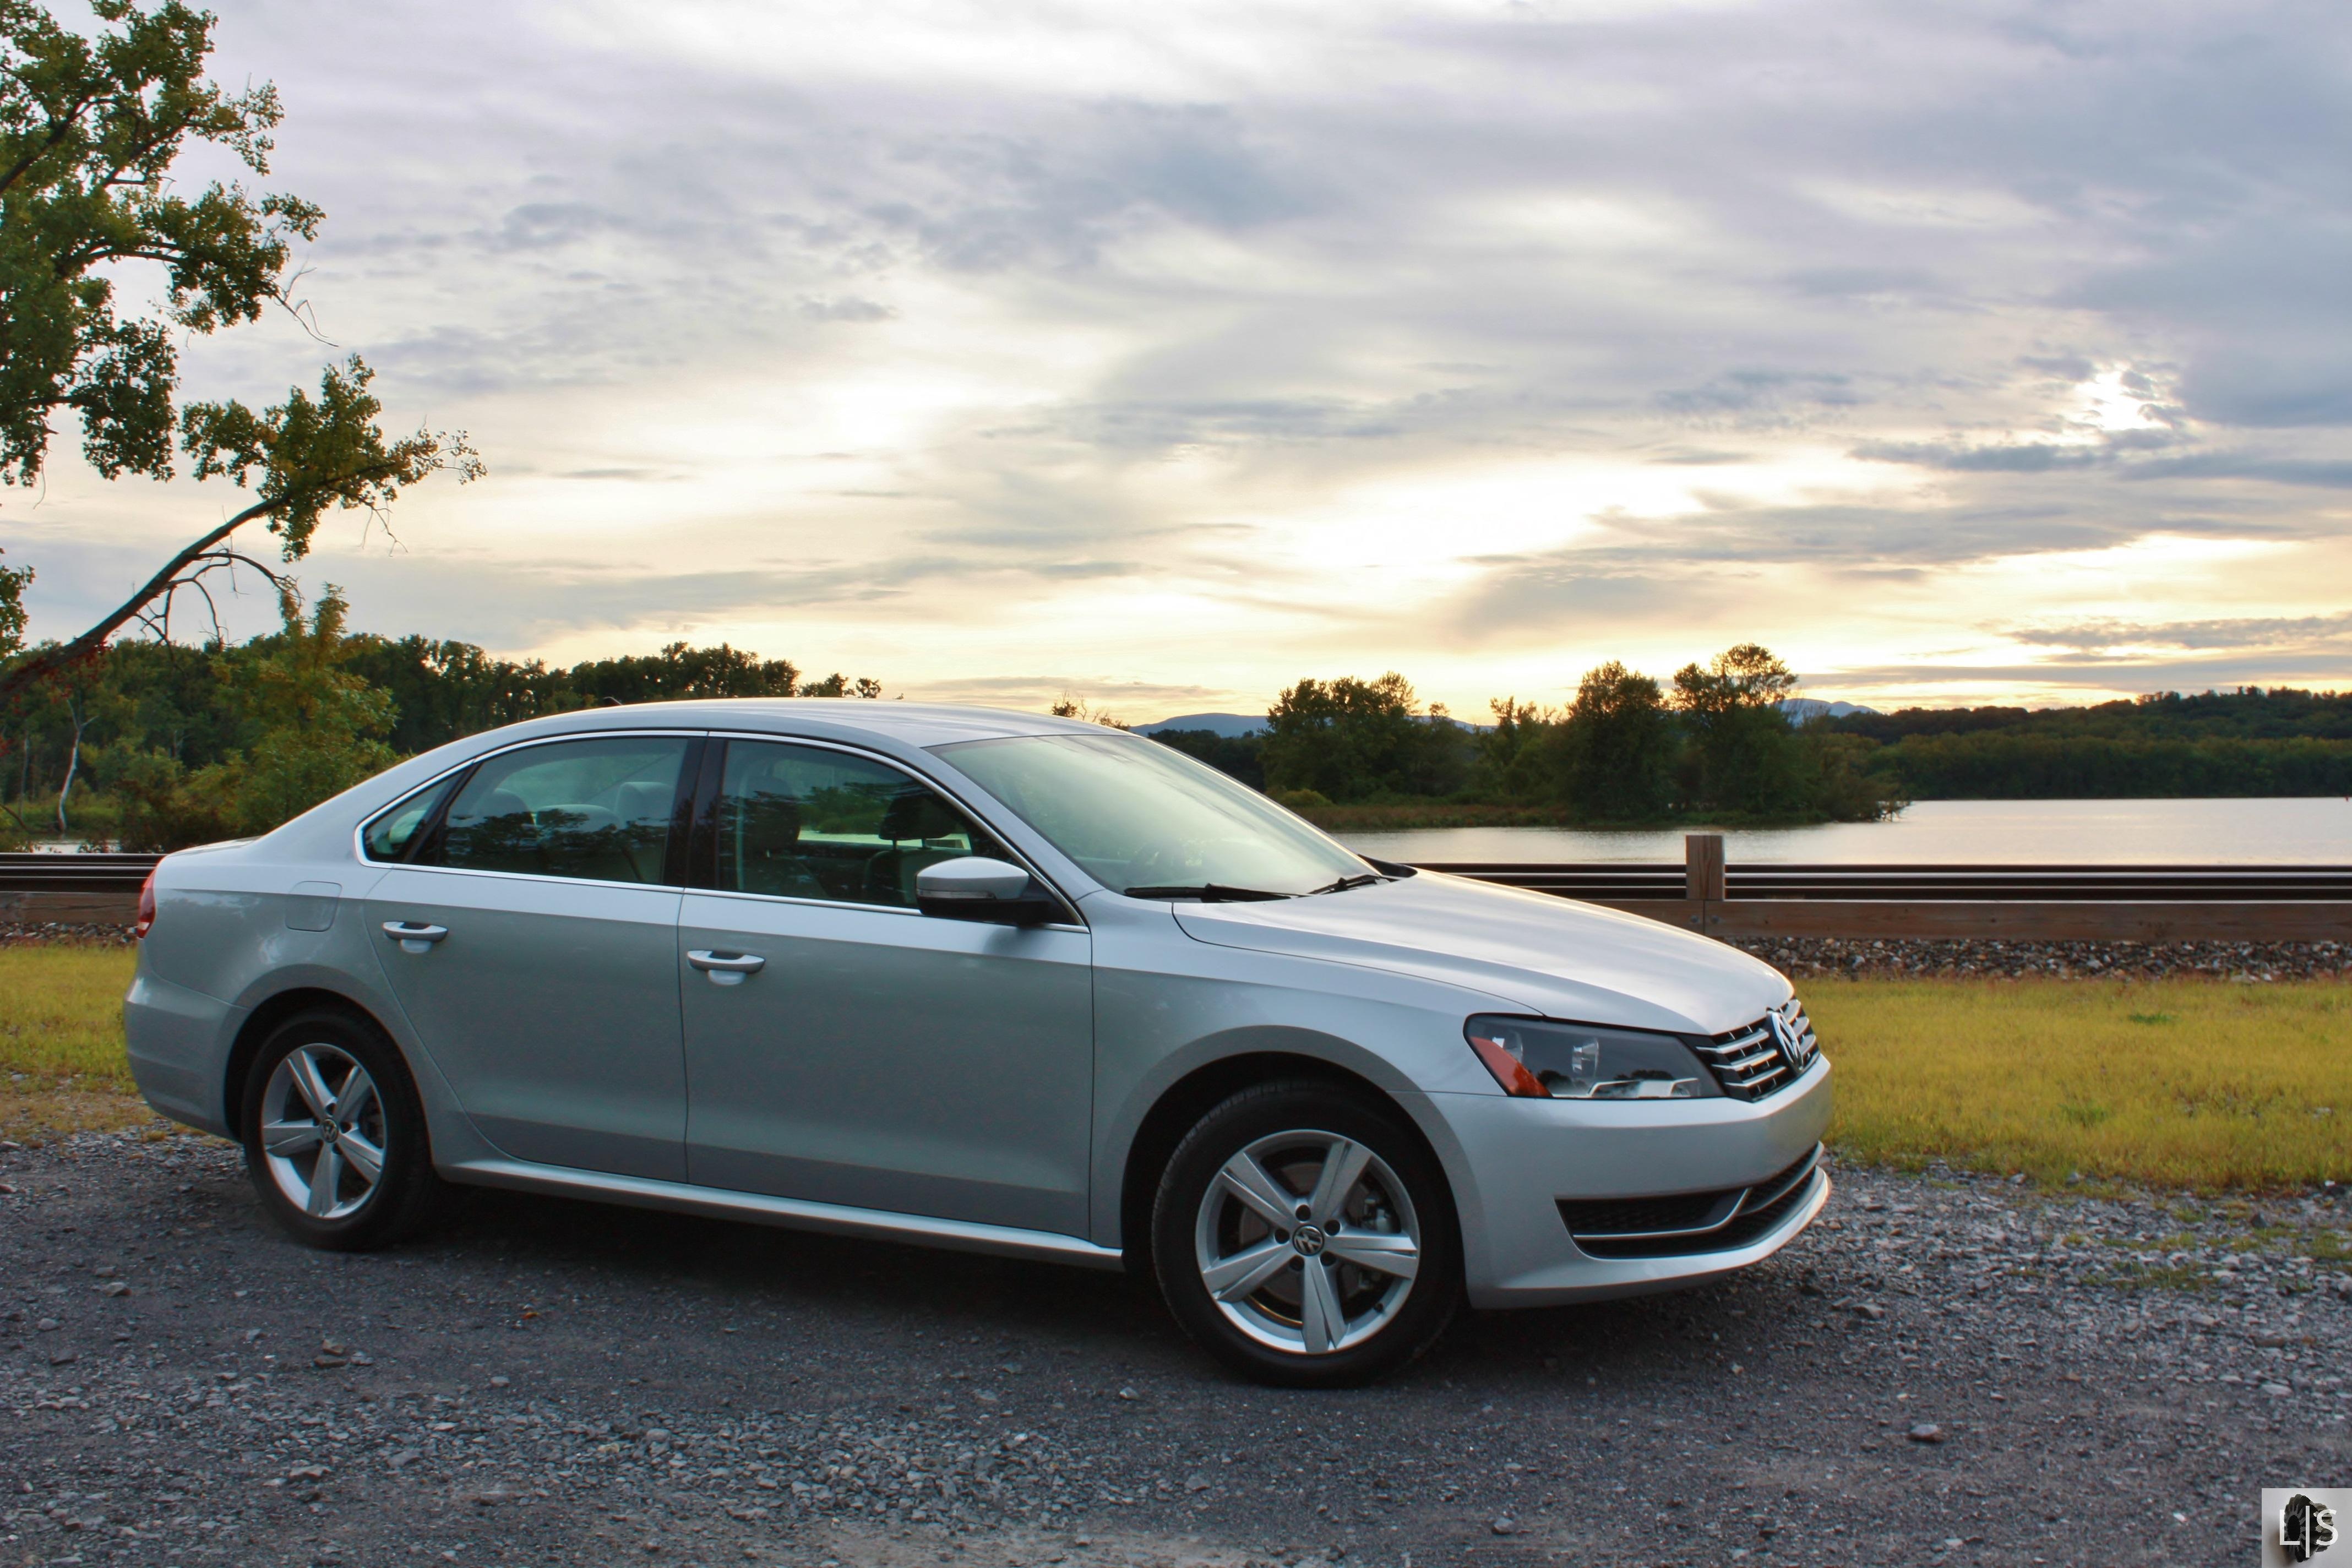 volkswagen car gear reviews top cc buyers tdi guide front review prevnext passat